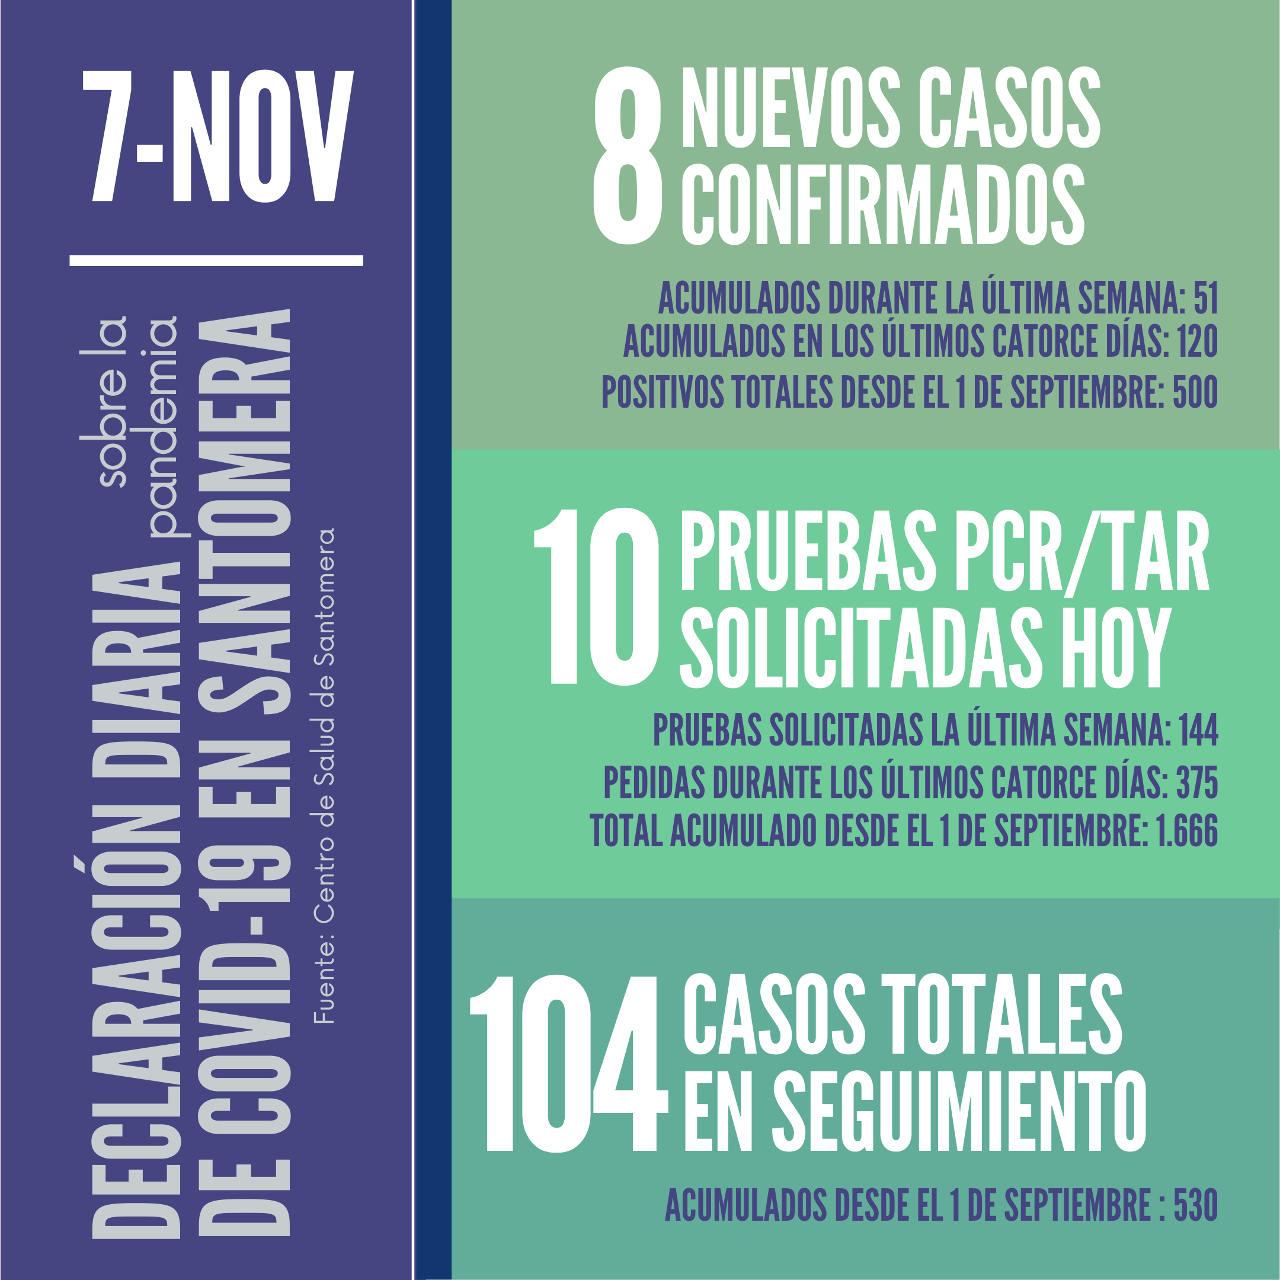 20201107_Datos COVID-19 Santomera